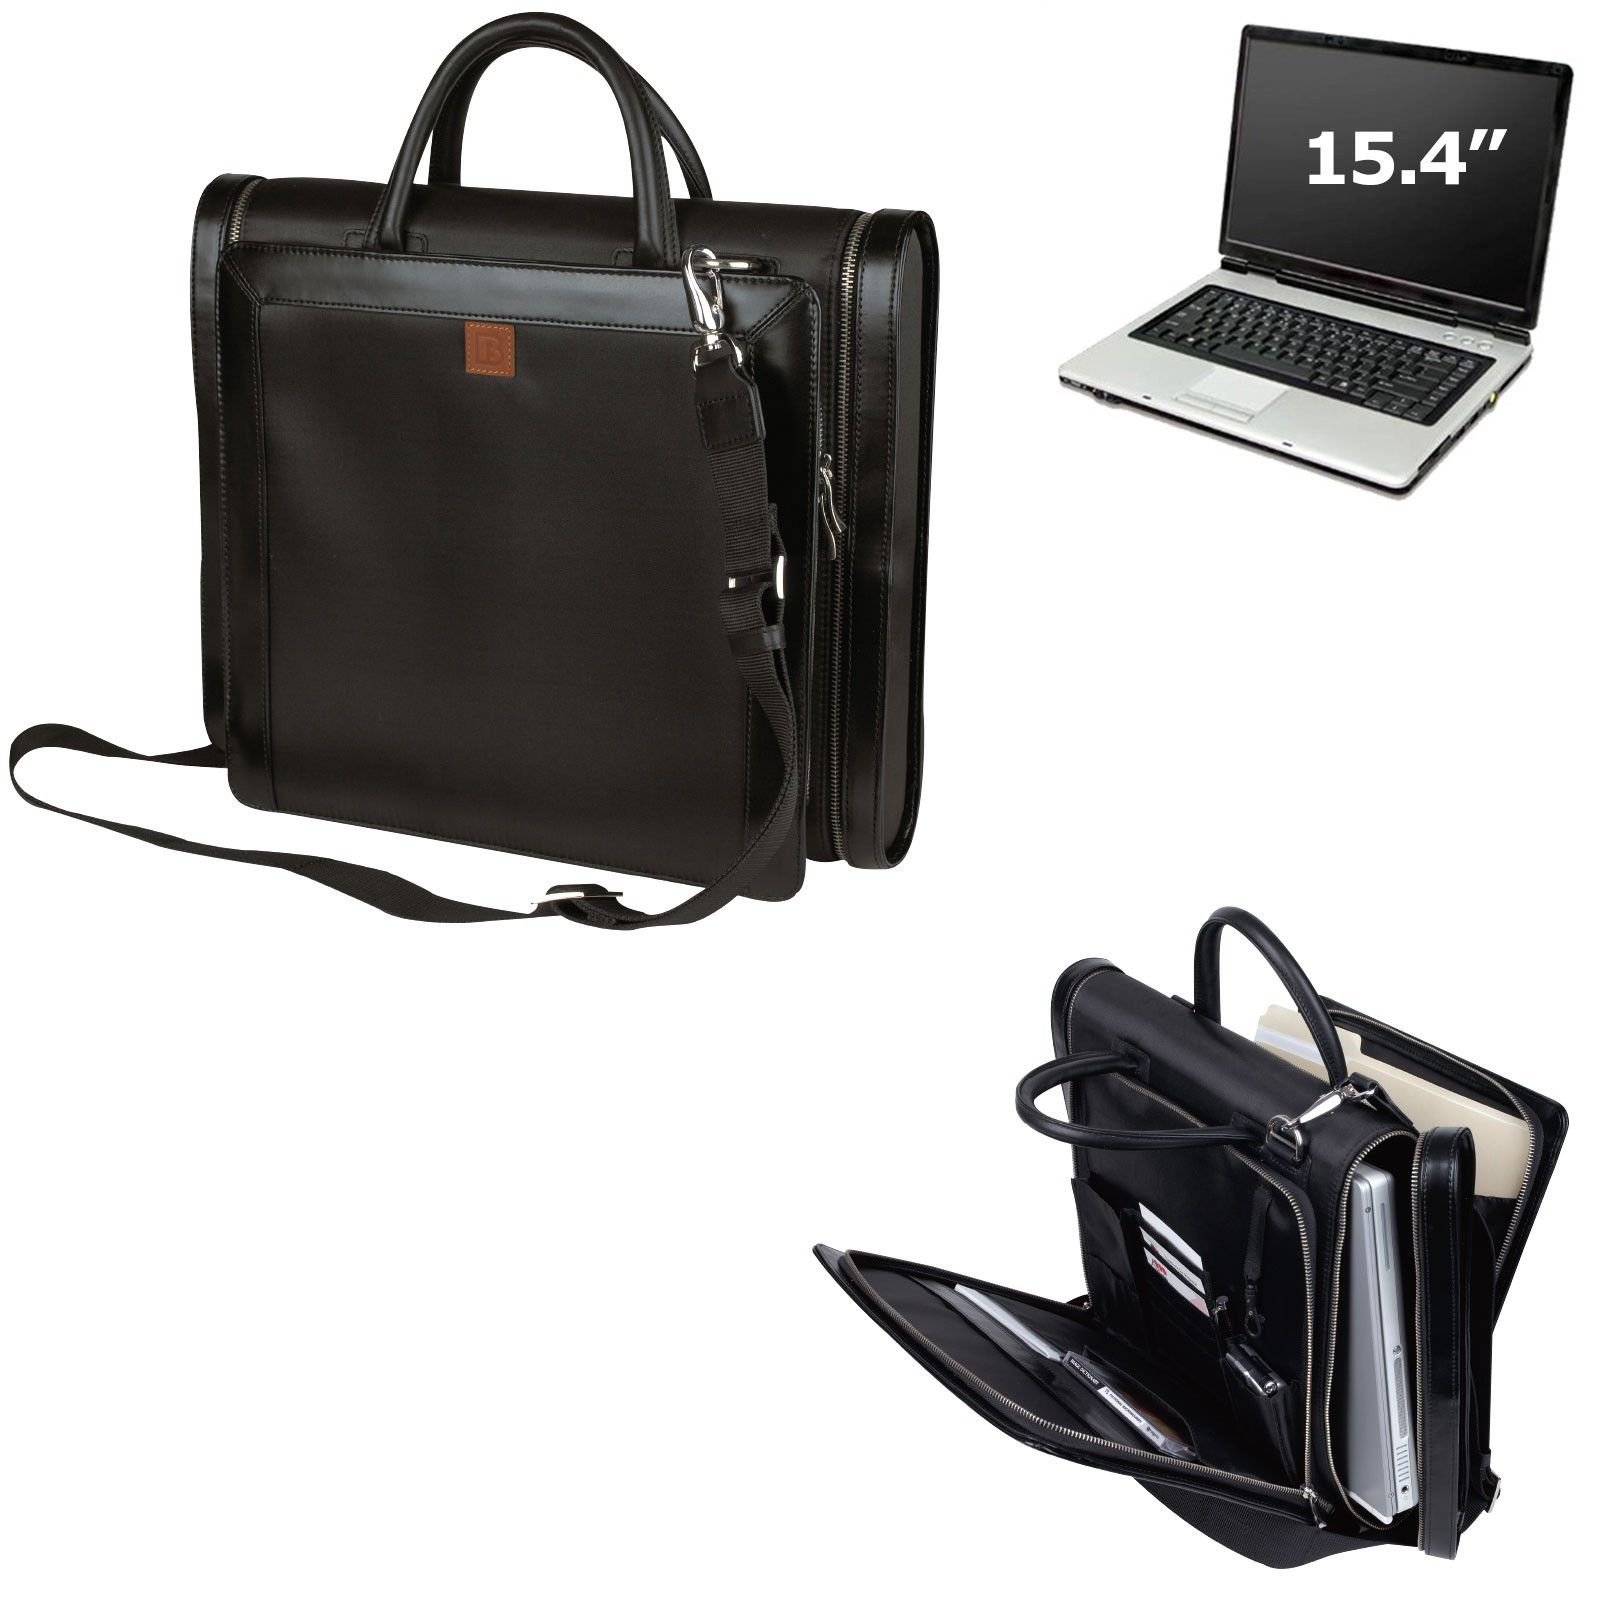 IMPECGEAR Manthattan Leather Trims Messenger Bag and handle Computer Shoulder Bag 15.4 Laptop by ImpecGear (Image #1)